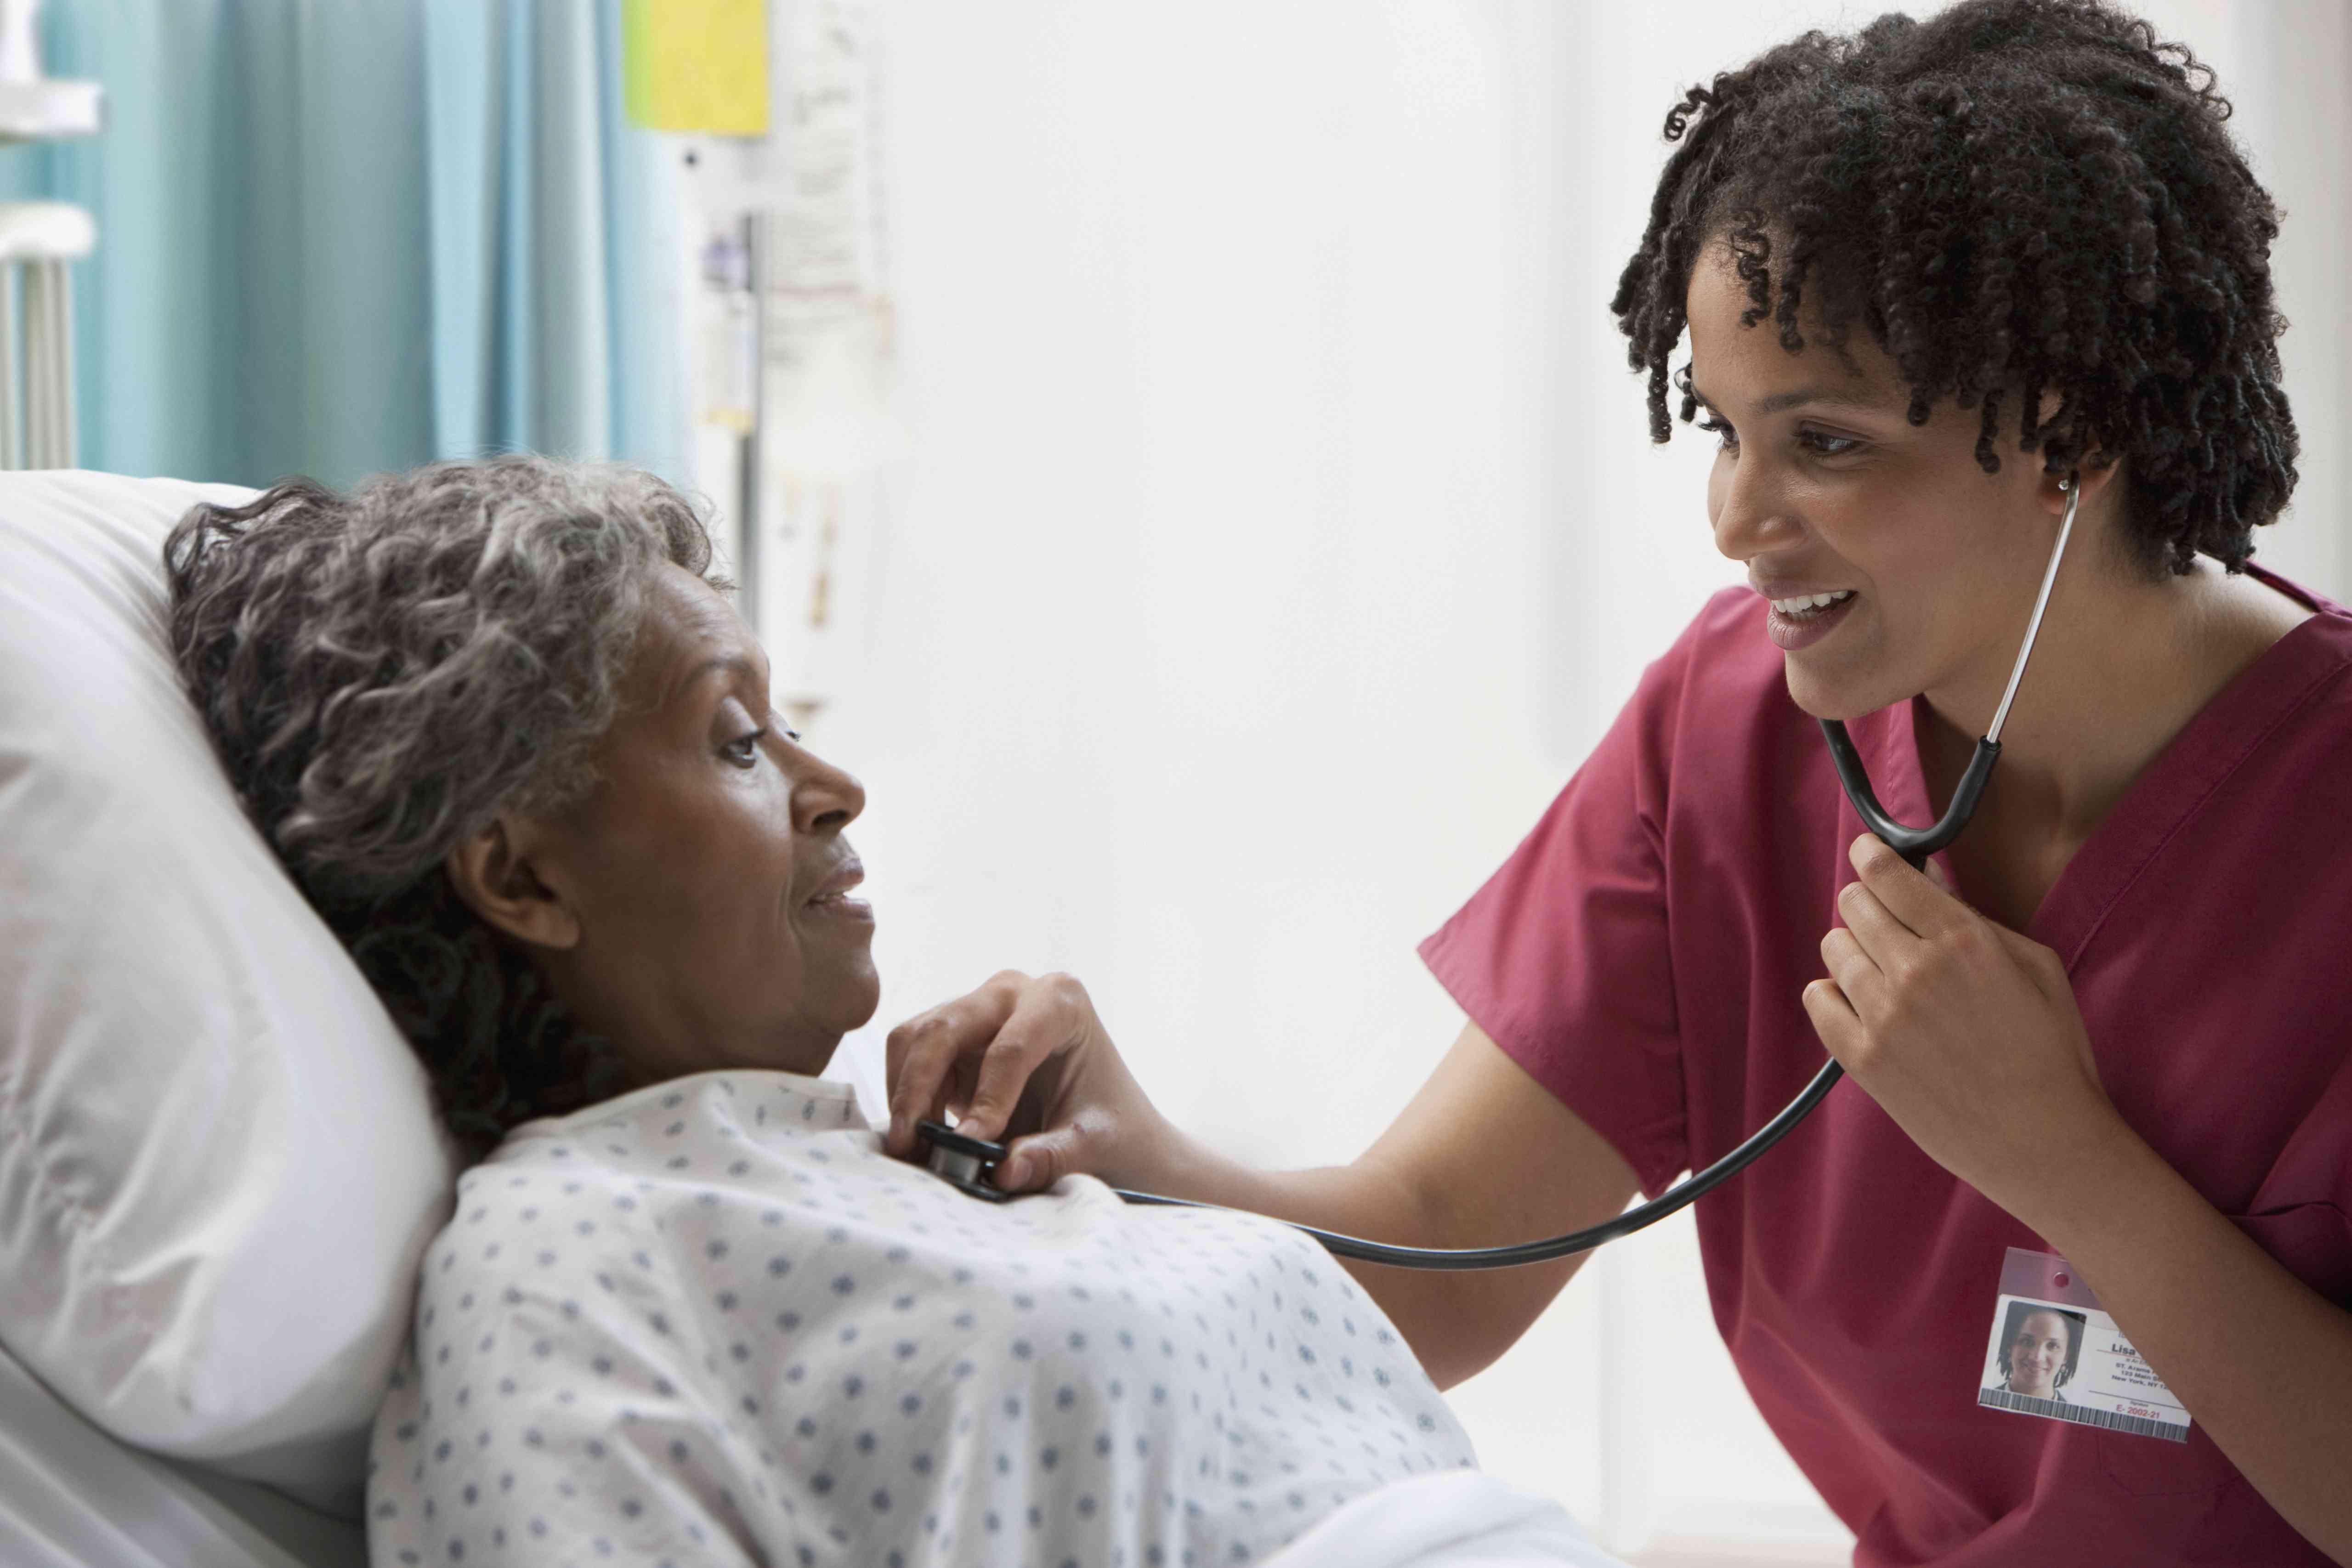 nurse using stethoscope on hospital patient